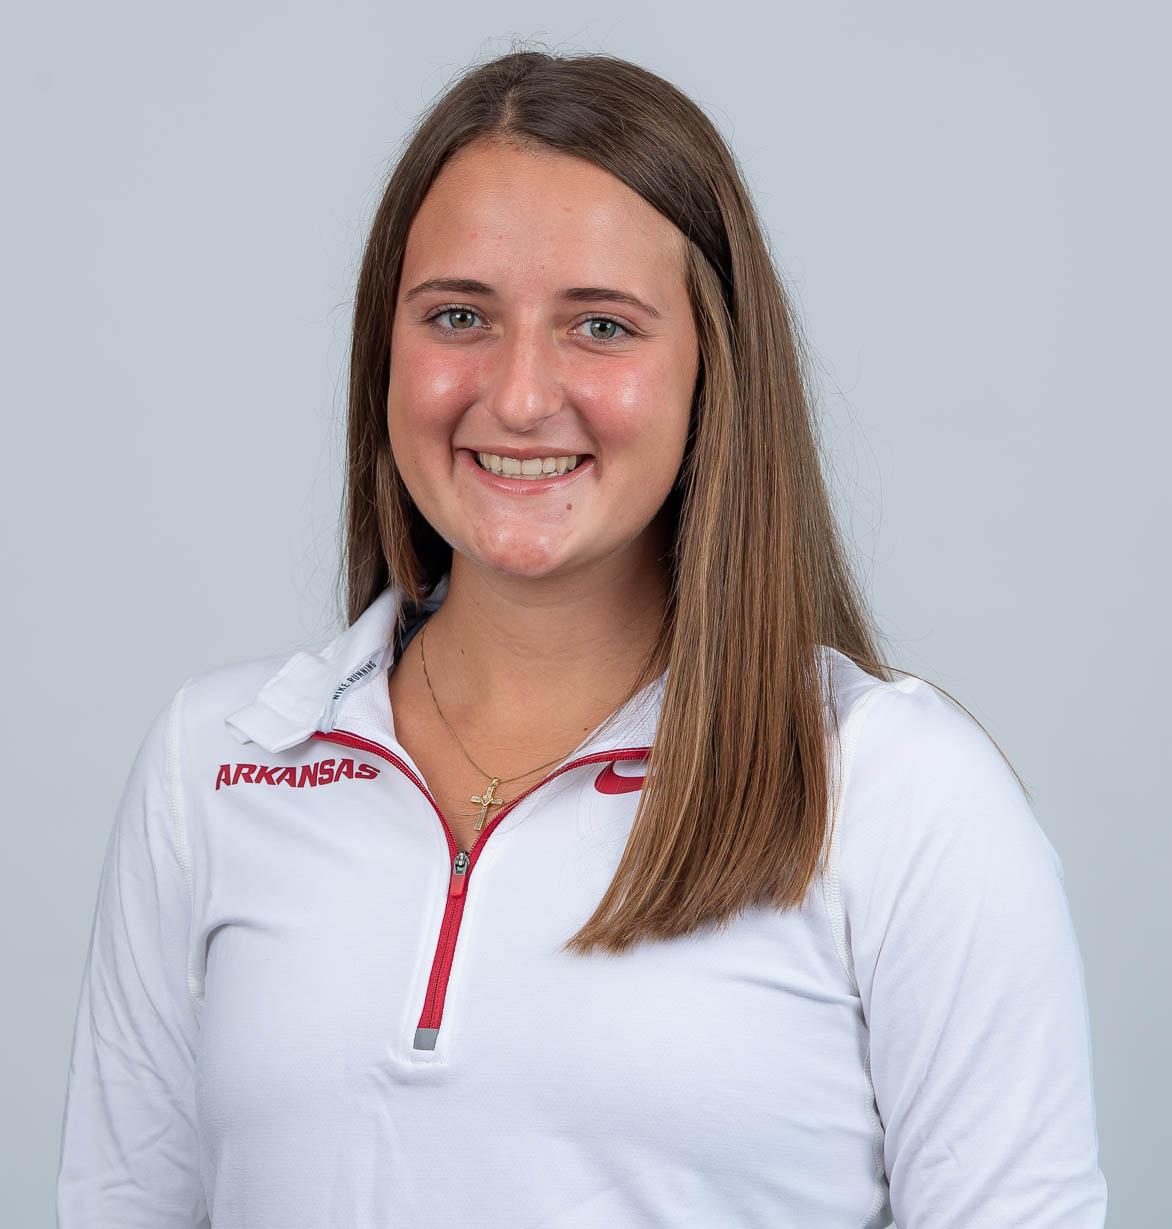 McKenzie Wilks - Women's Cross Country - Arkansas Razorbacks